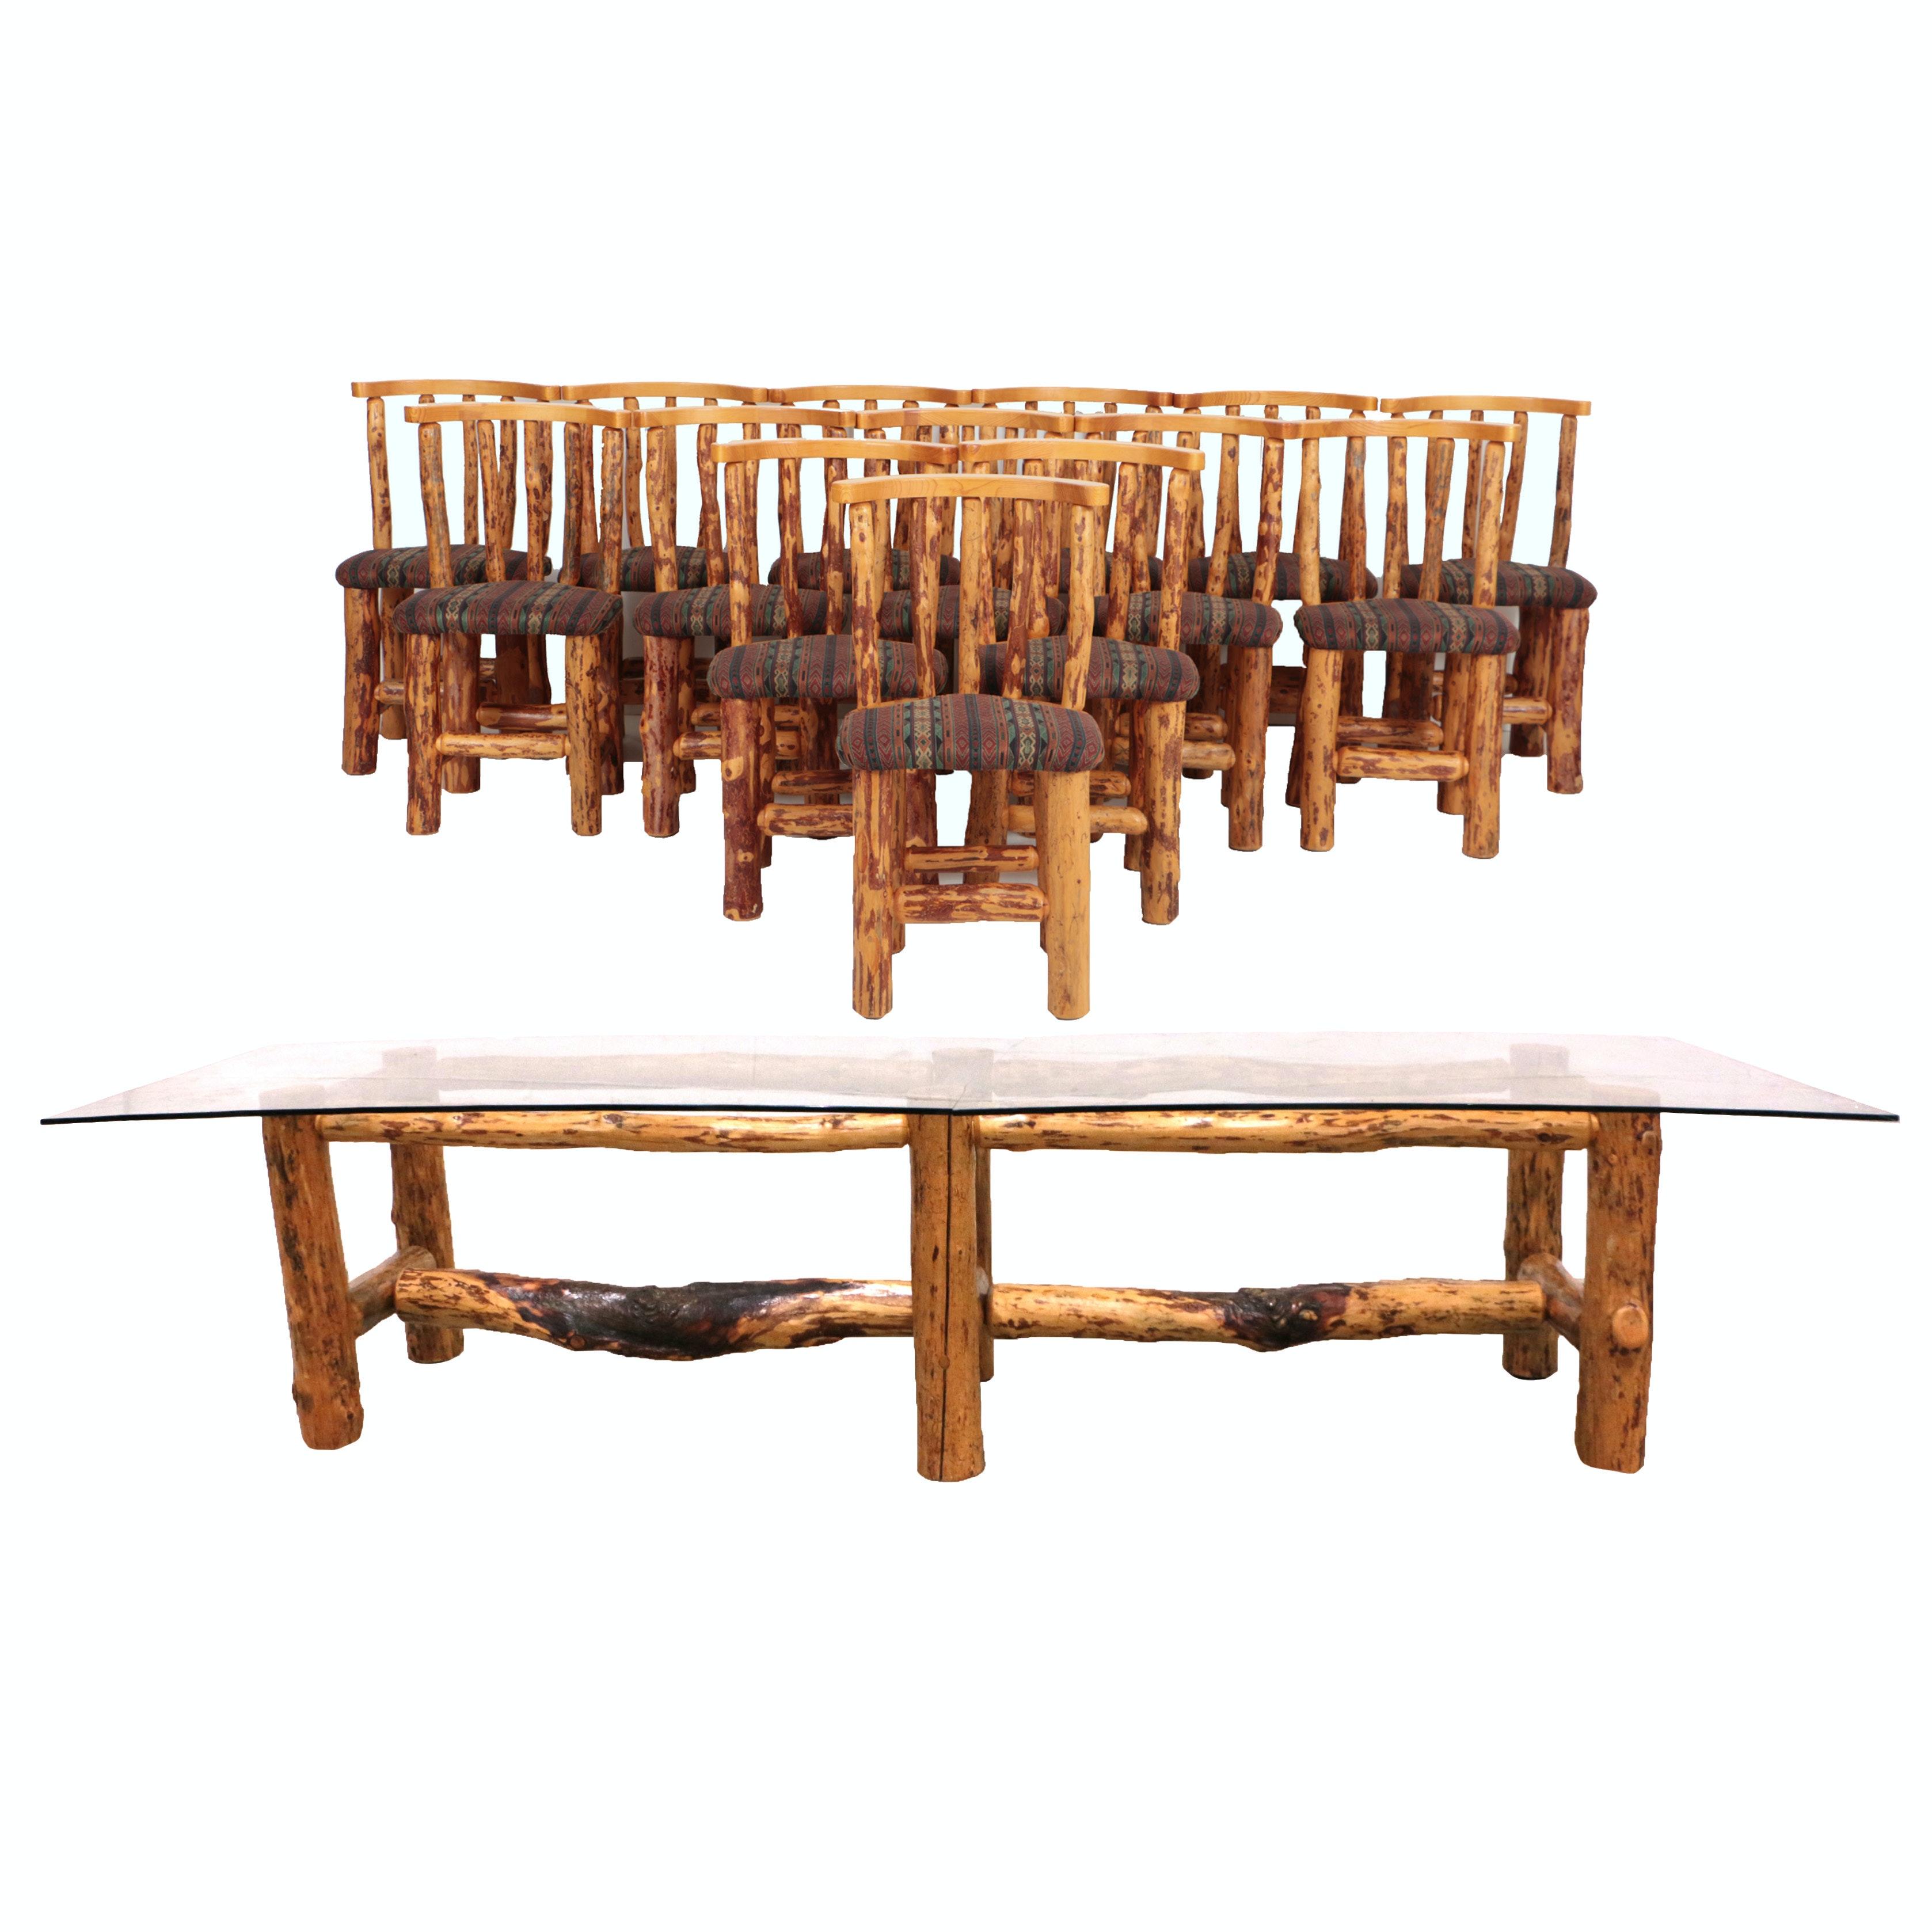 Ponderosa Pine Fifteen Piece Log Dining Set By Rodney Buchholz For Ru0026R  Ventures ...